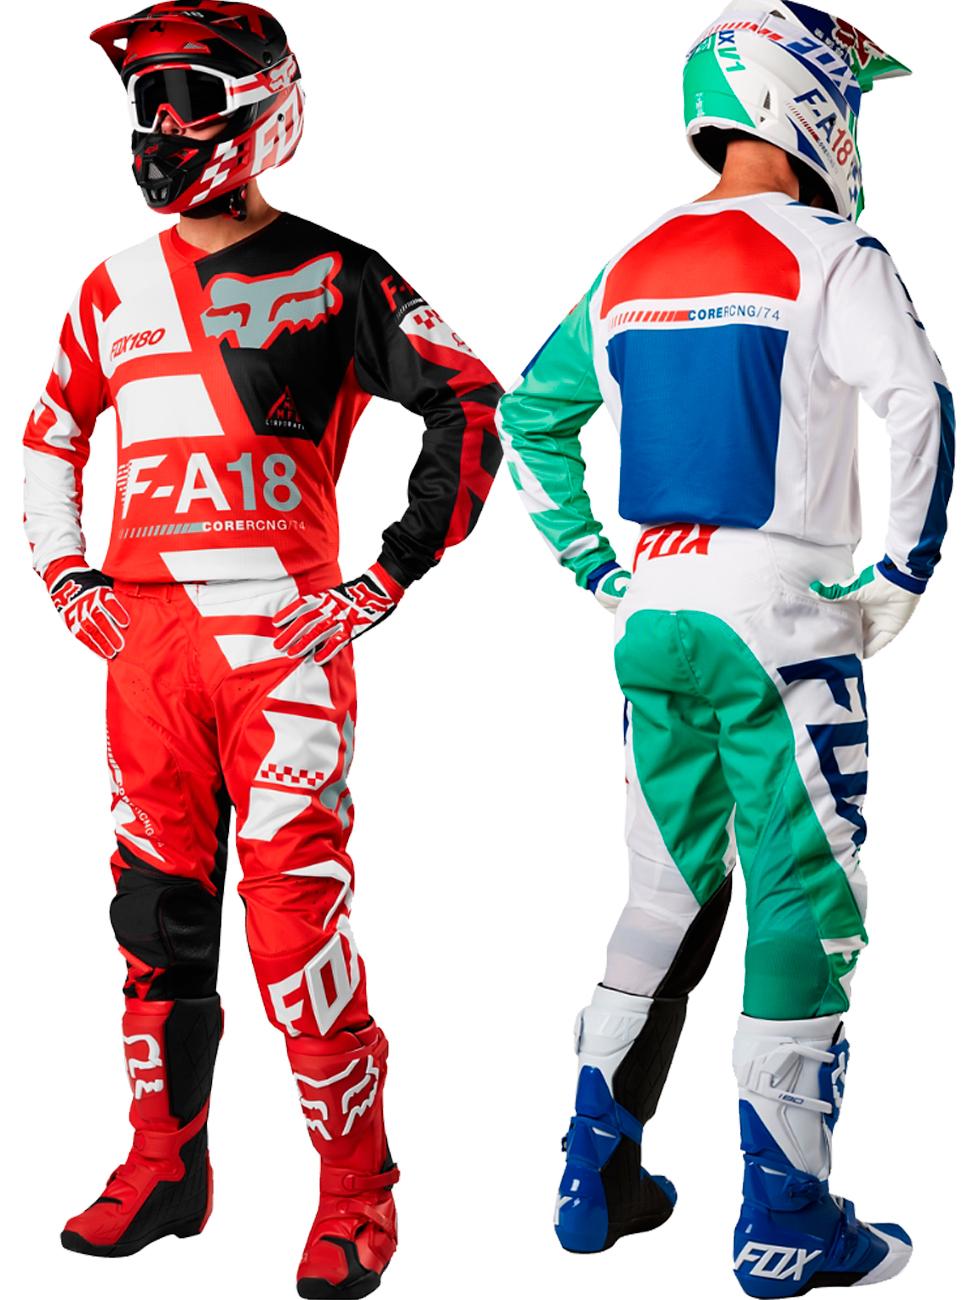 Especificando, a Camisa Fox 180 Sayak possui  30a978f86d